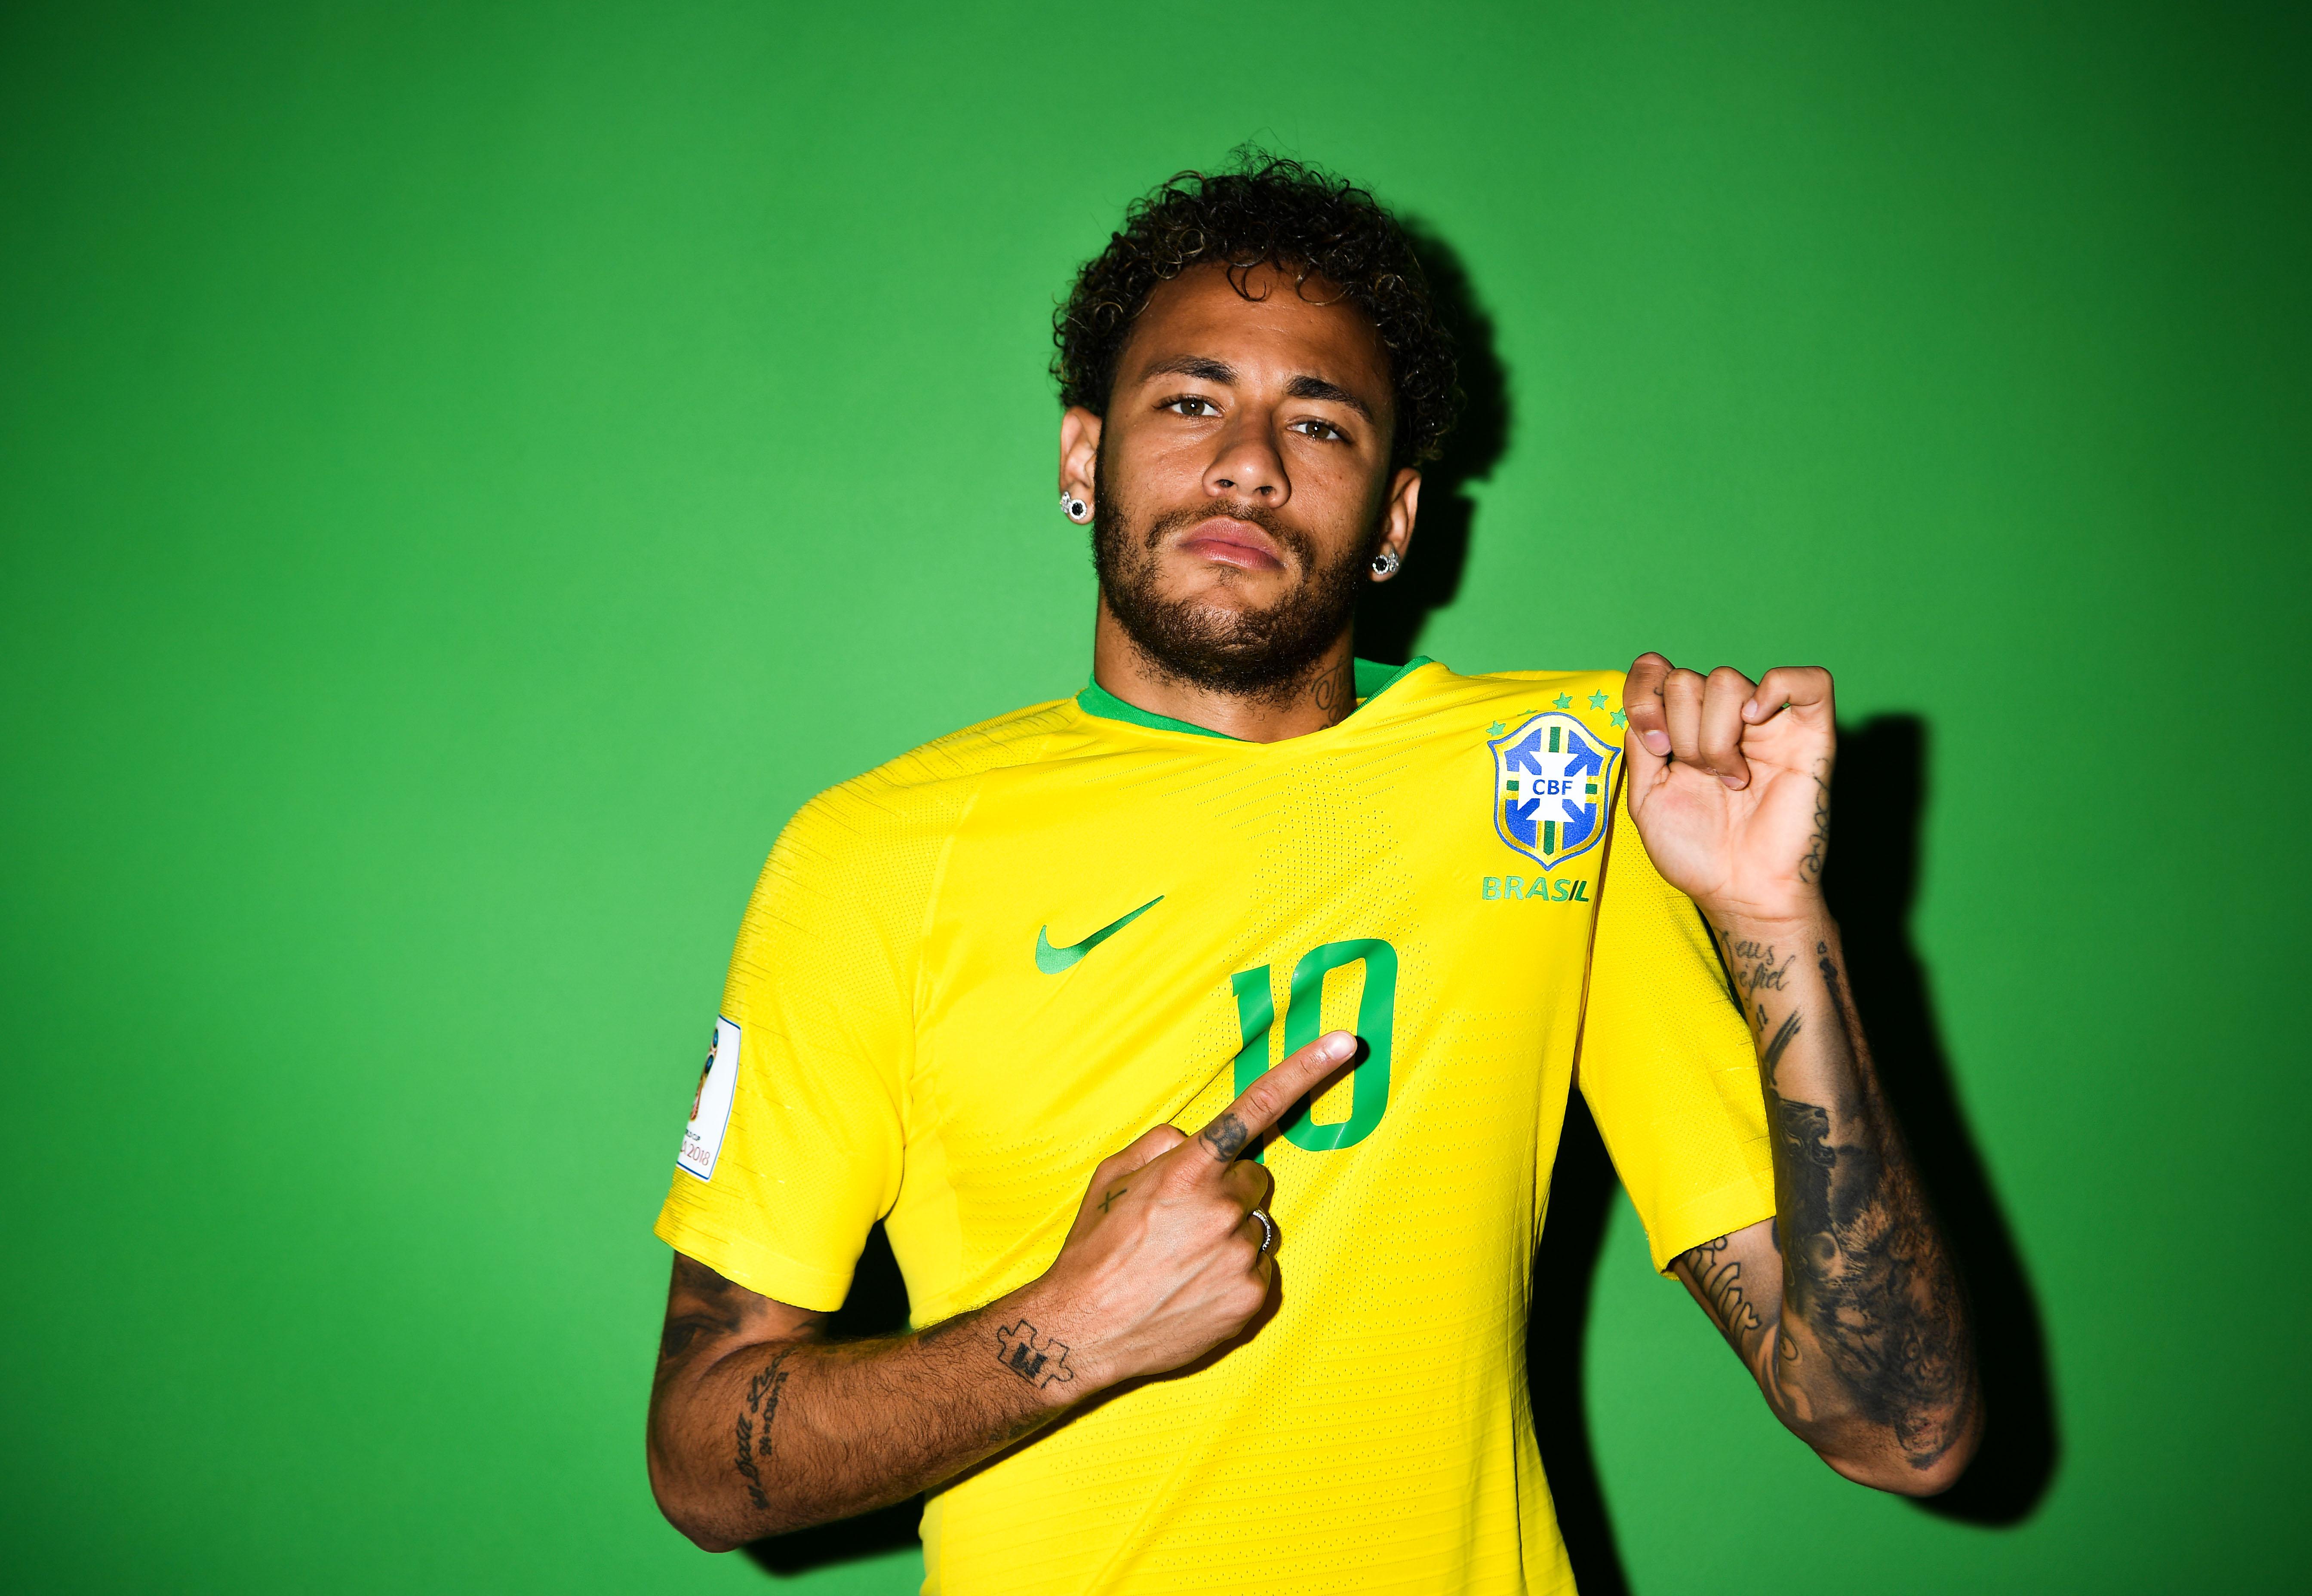 Neymar jr brazil portraits hd sports 4k wallpapers - Neymar brazil hd ...